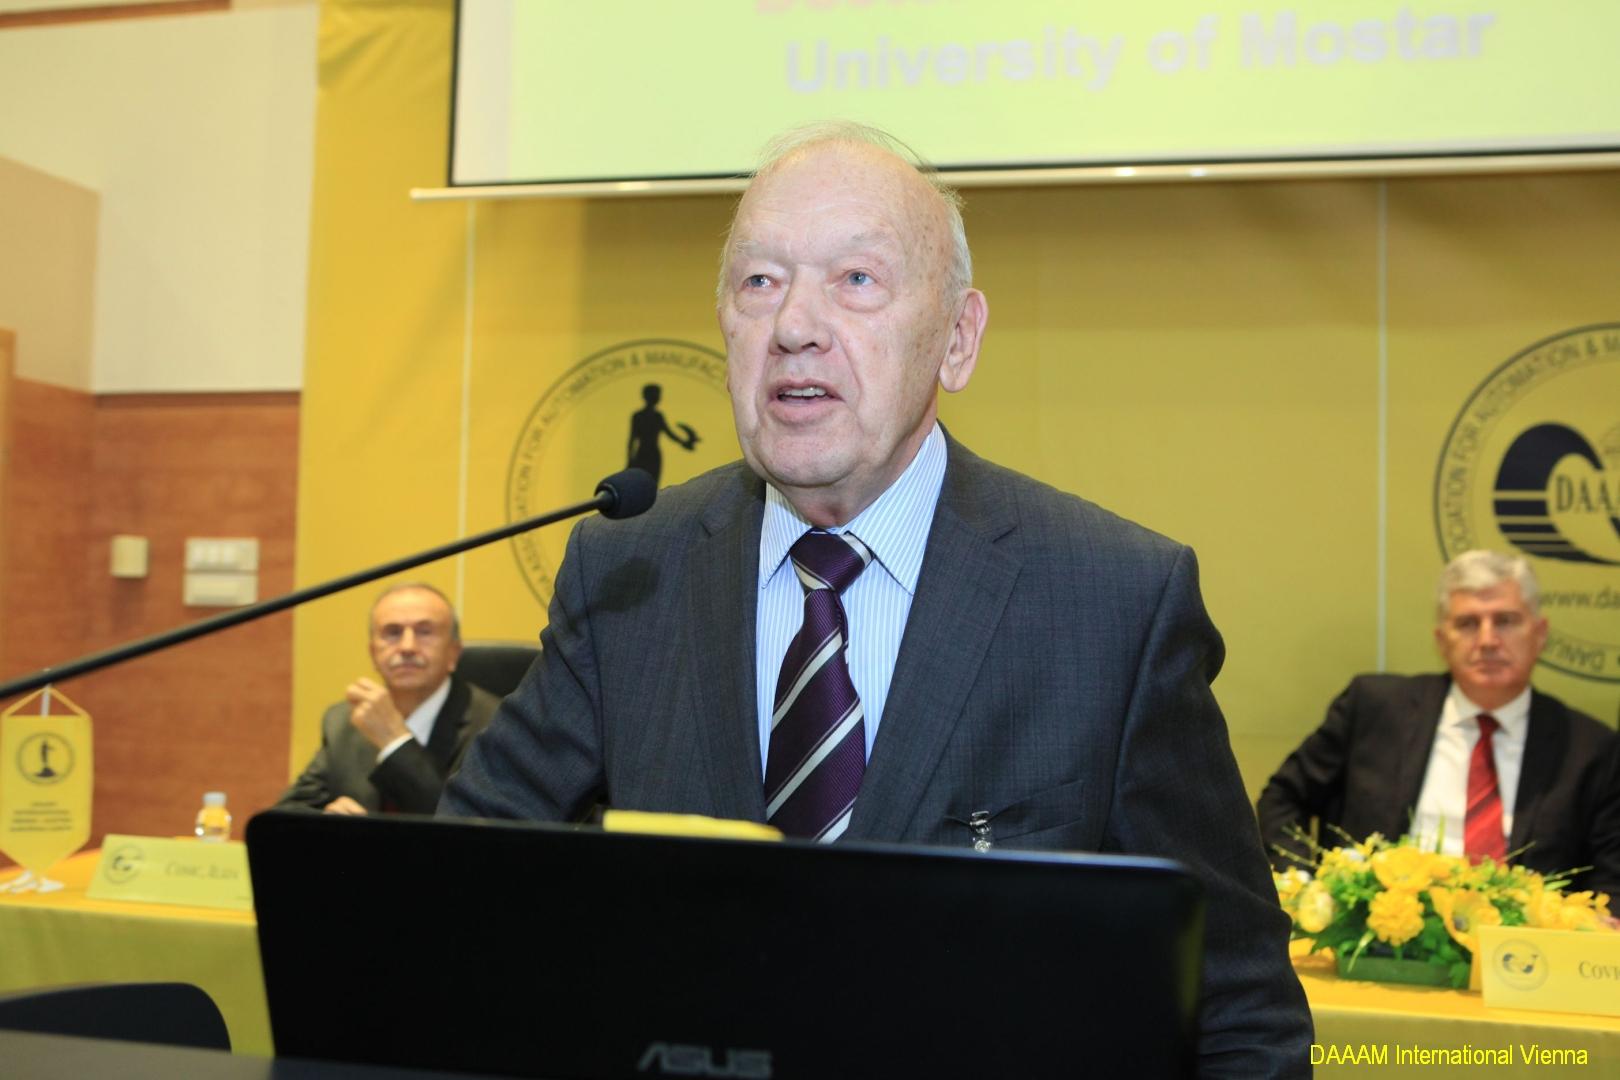 DAAAM_2016_Mostar_06_Professor_and_Cosmonaut_Alexey_Eliseev_Doctor_honors_causa_028